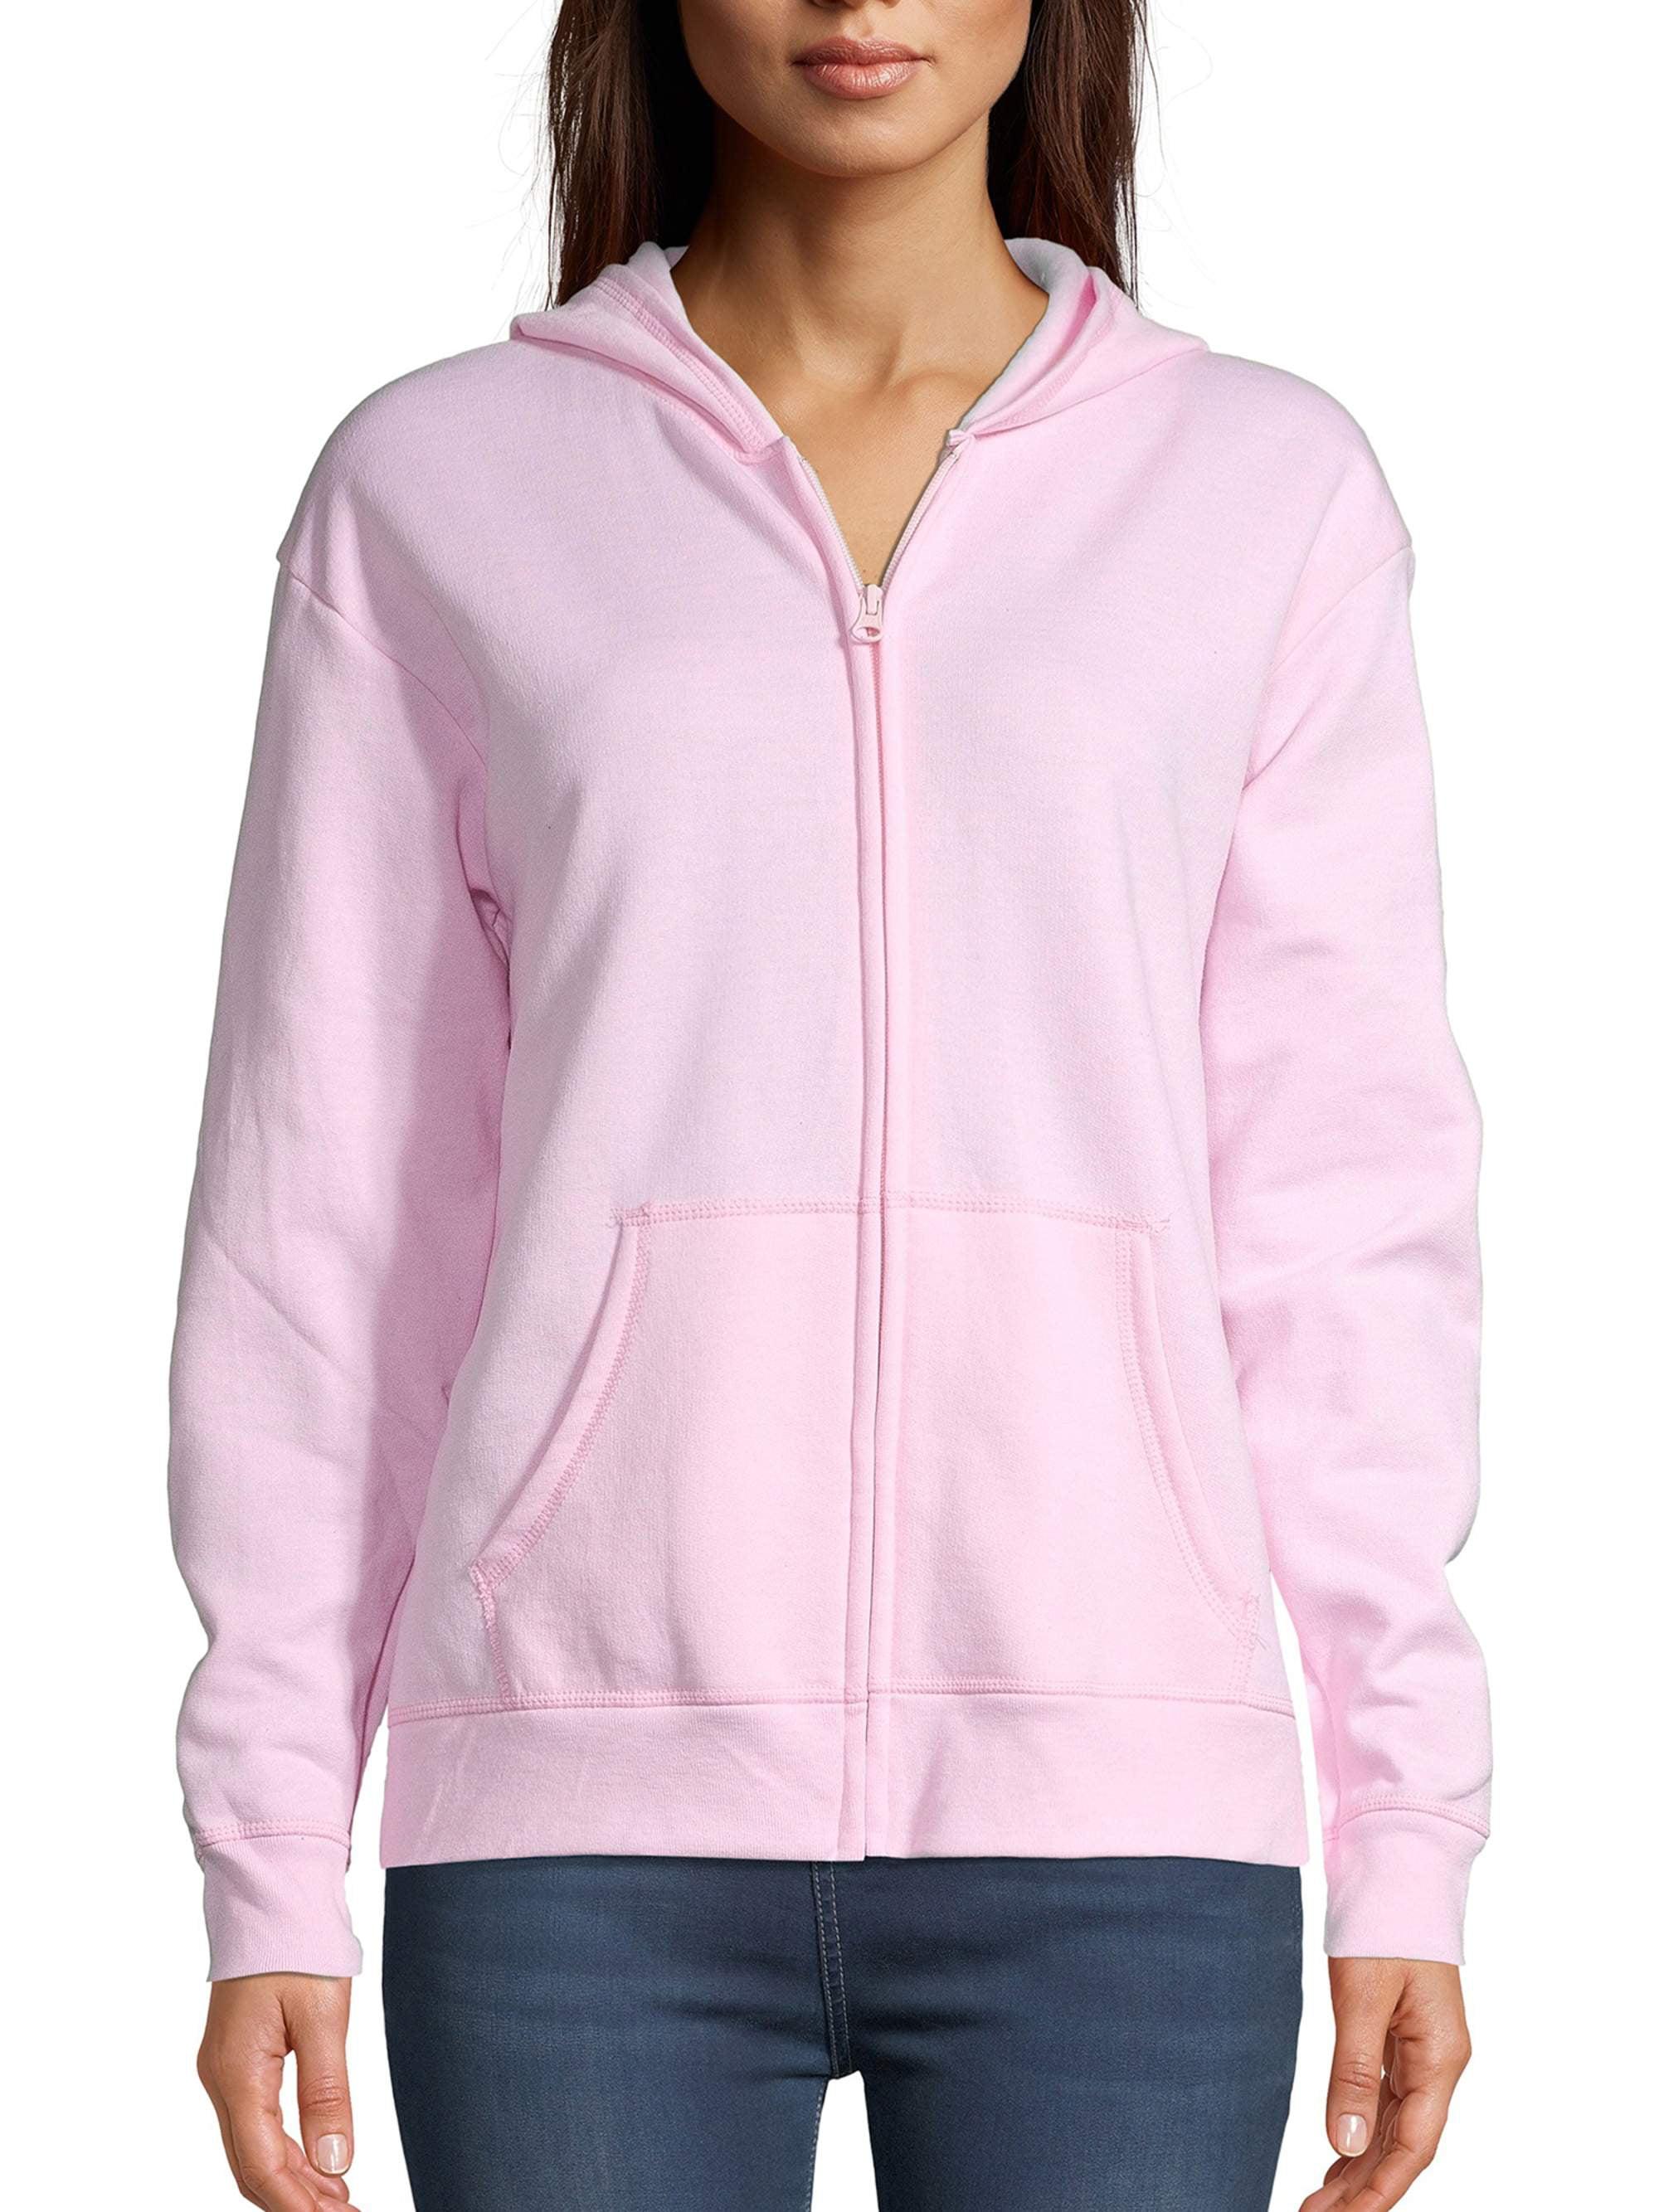 Hanes Womens Full-Zip Hooded Jacket Warm Up or Track Jacket